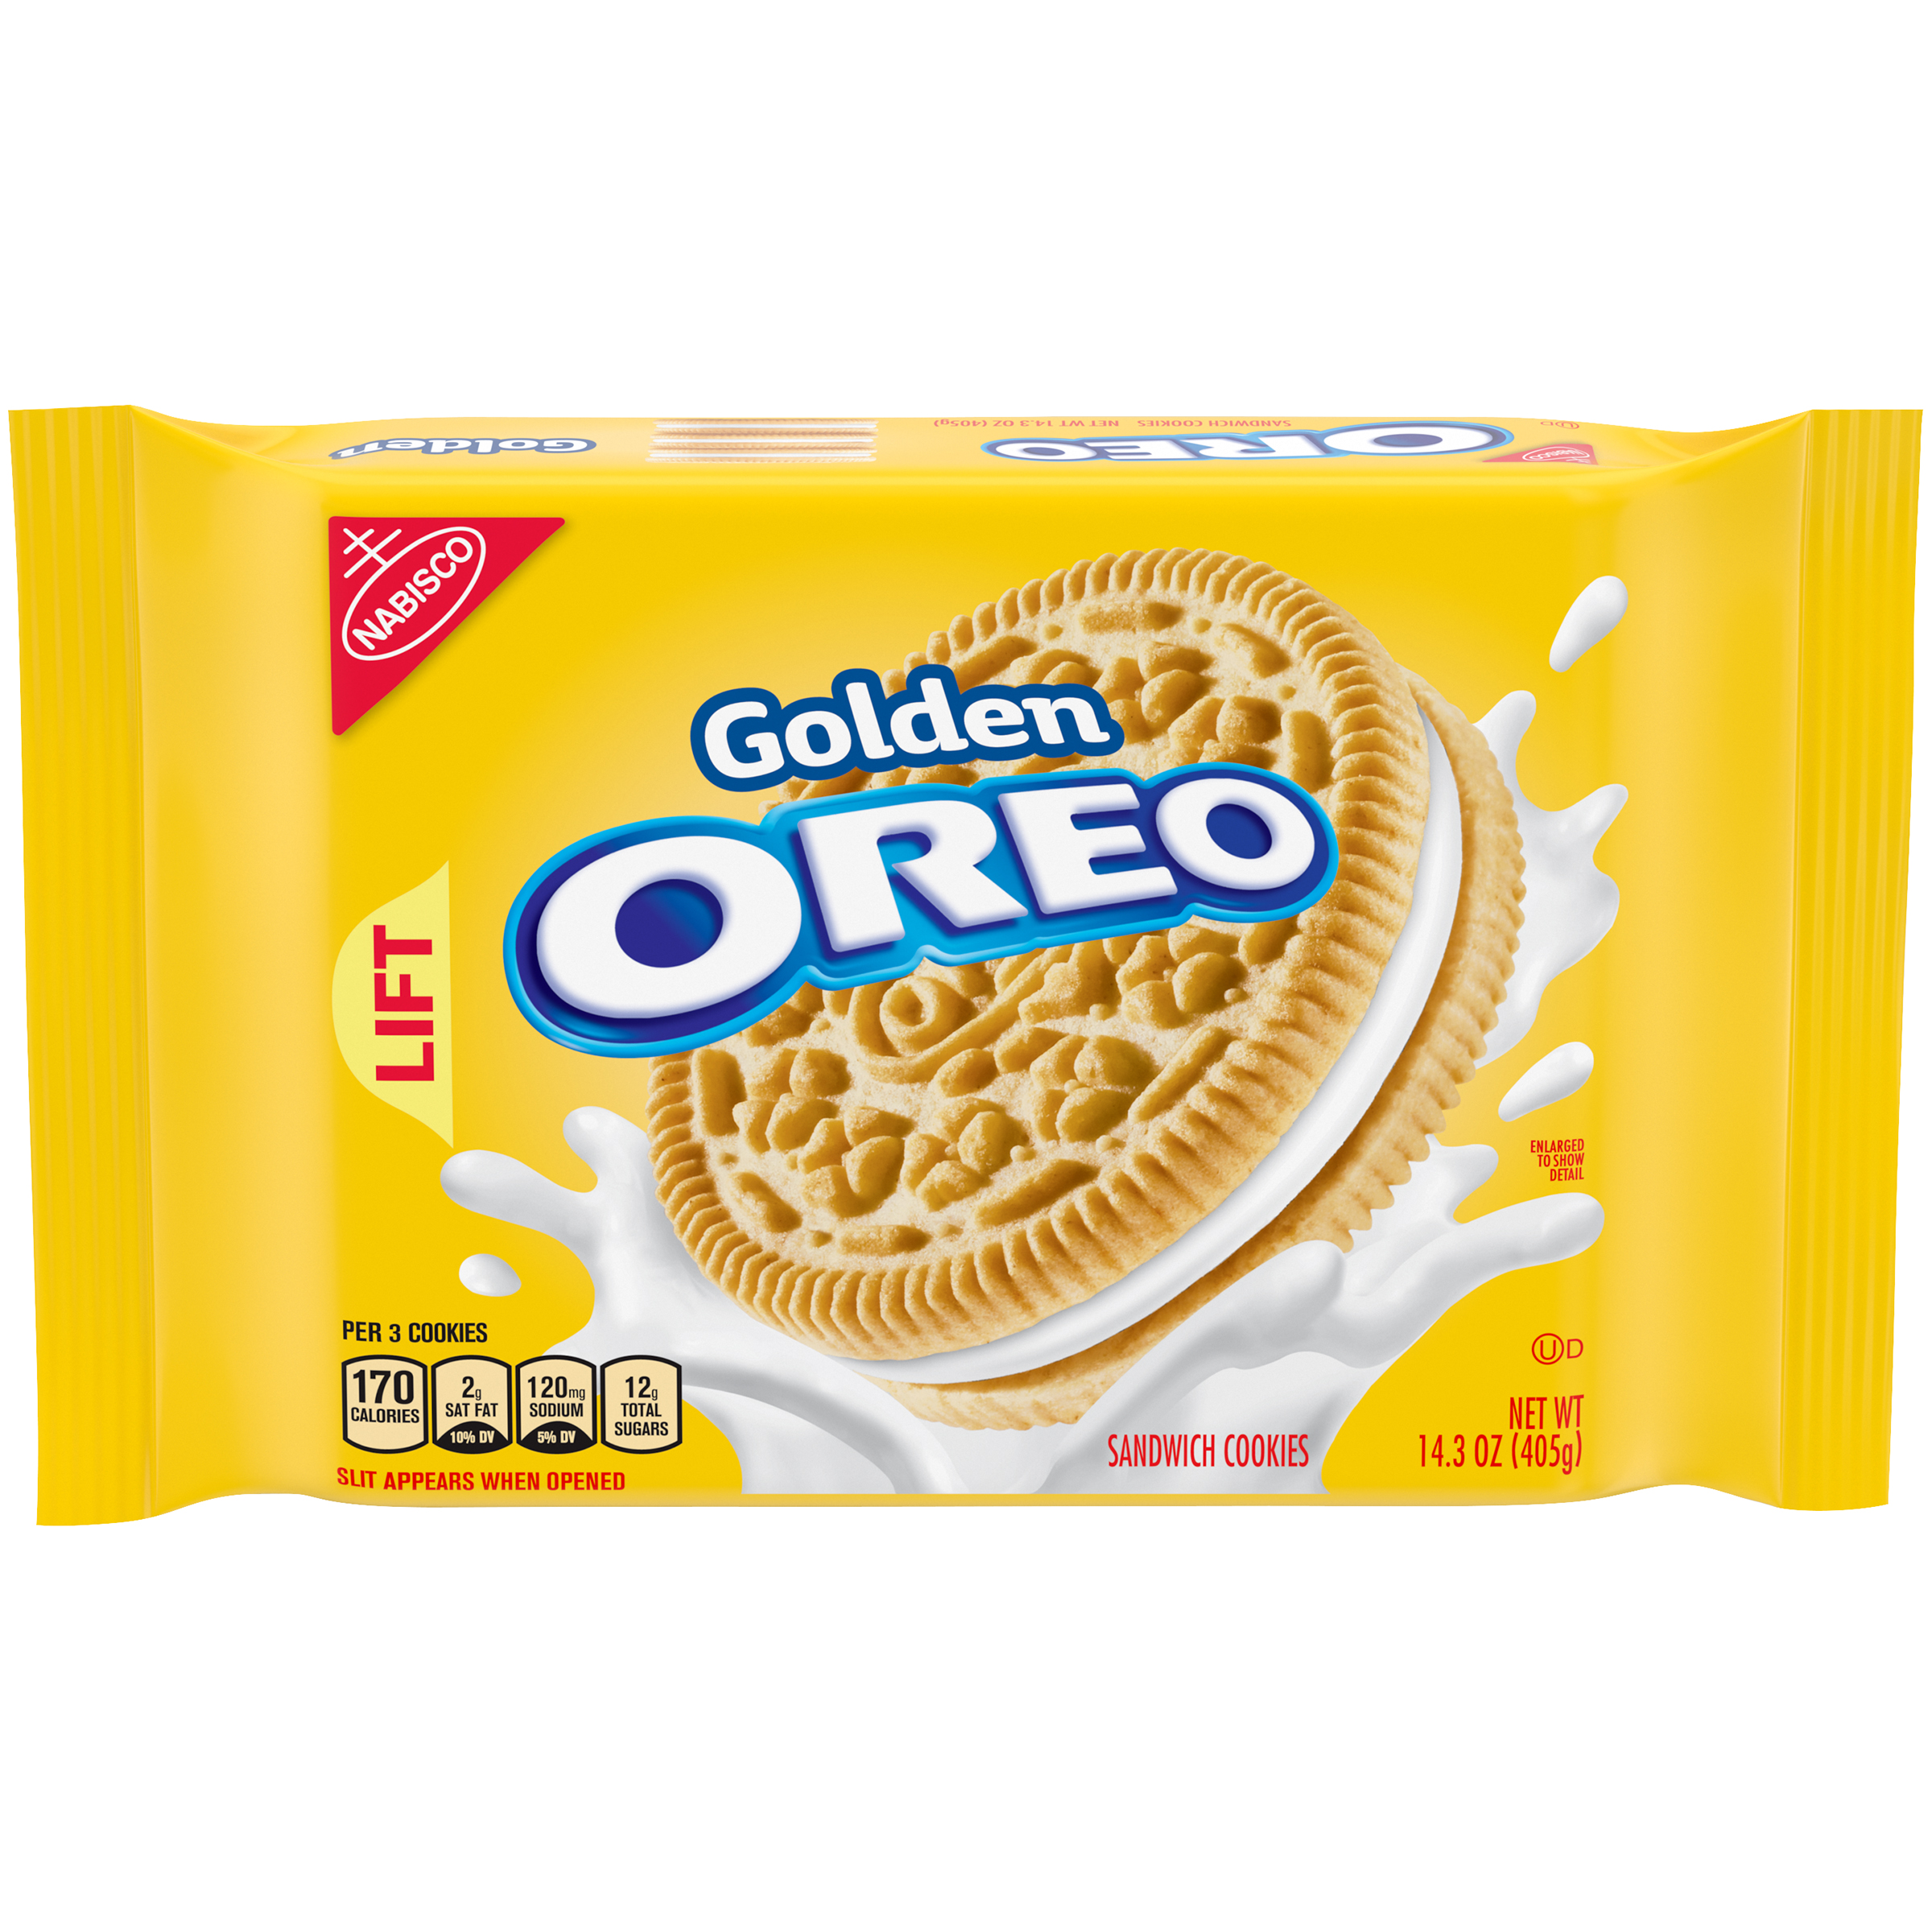 OREO Golden Cookies 14.3 oz